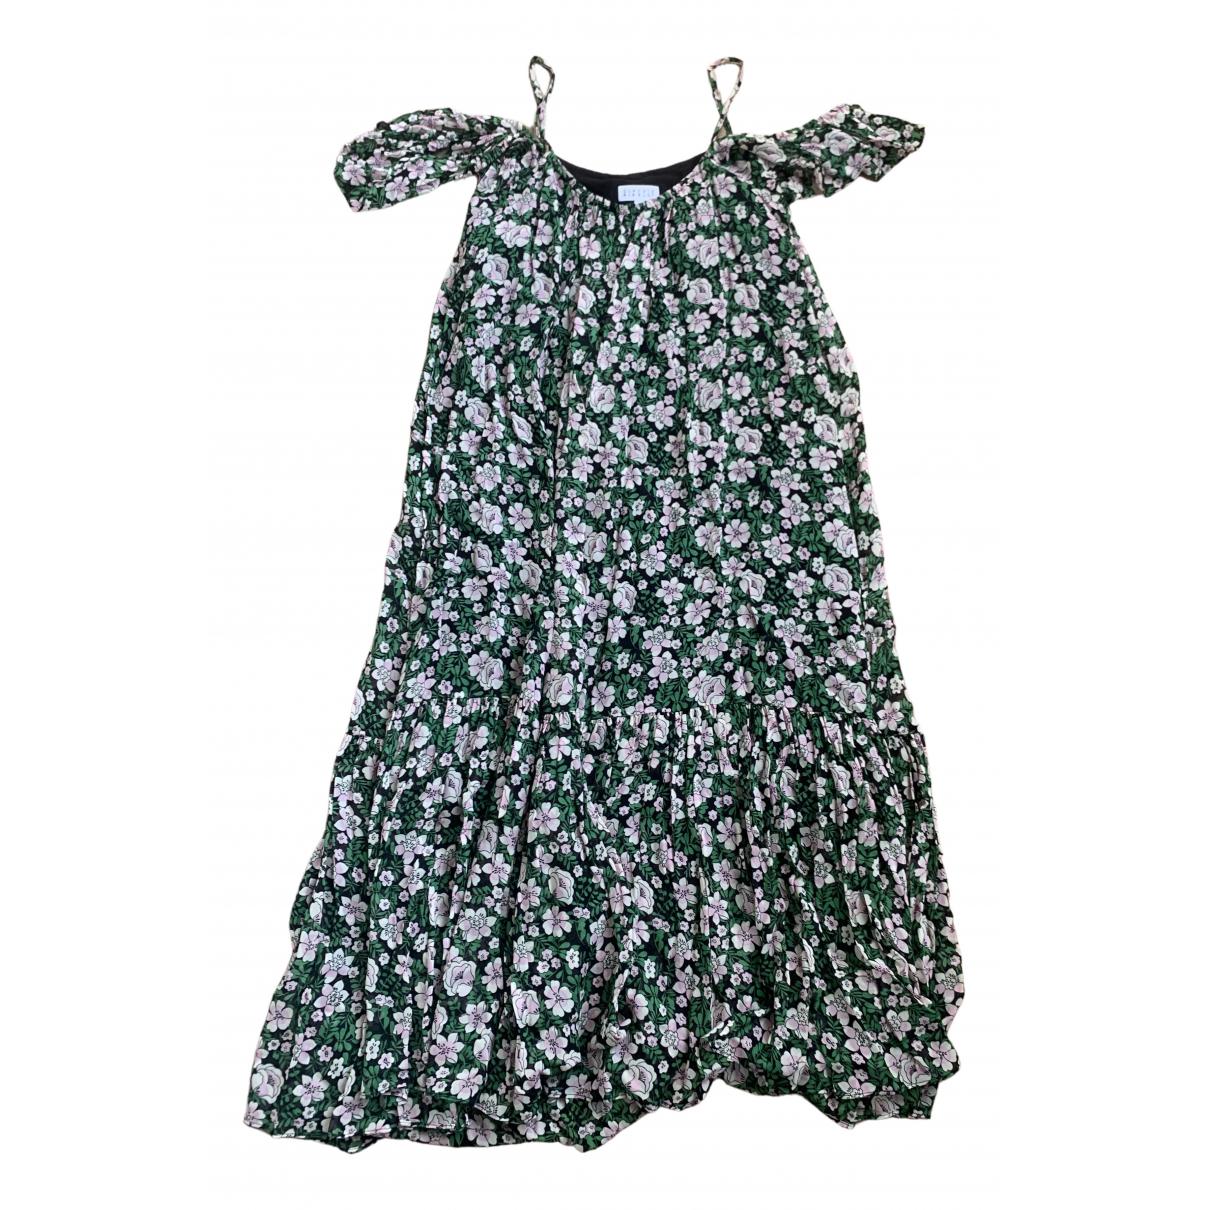 Claudie Pierlot Spring Summer 2019 Multicolour dress for Women 36 FR